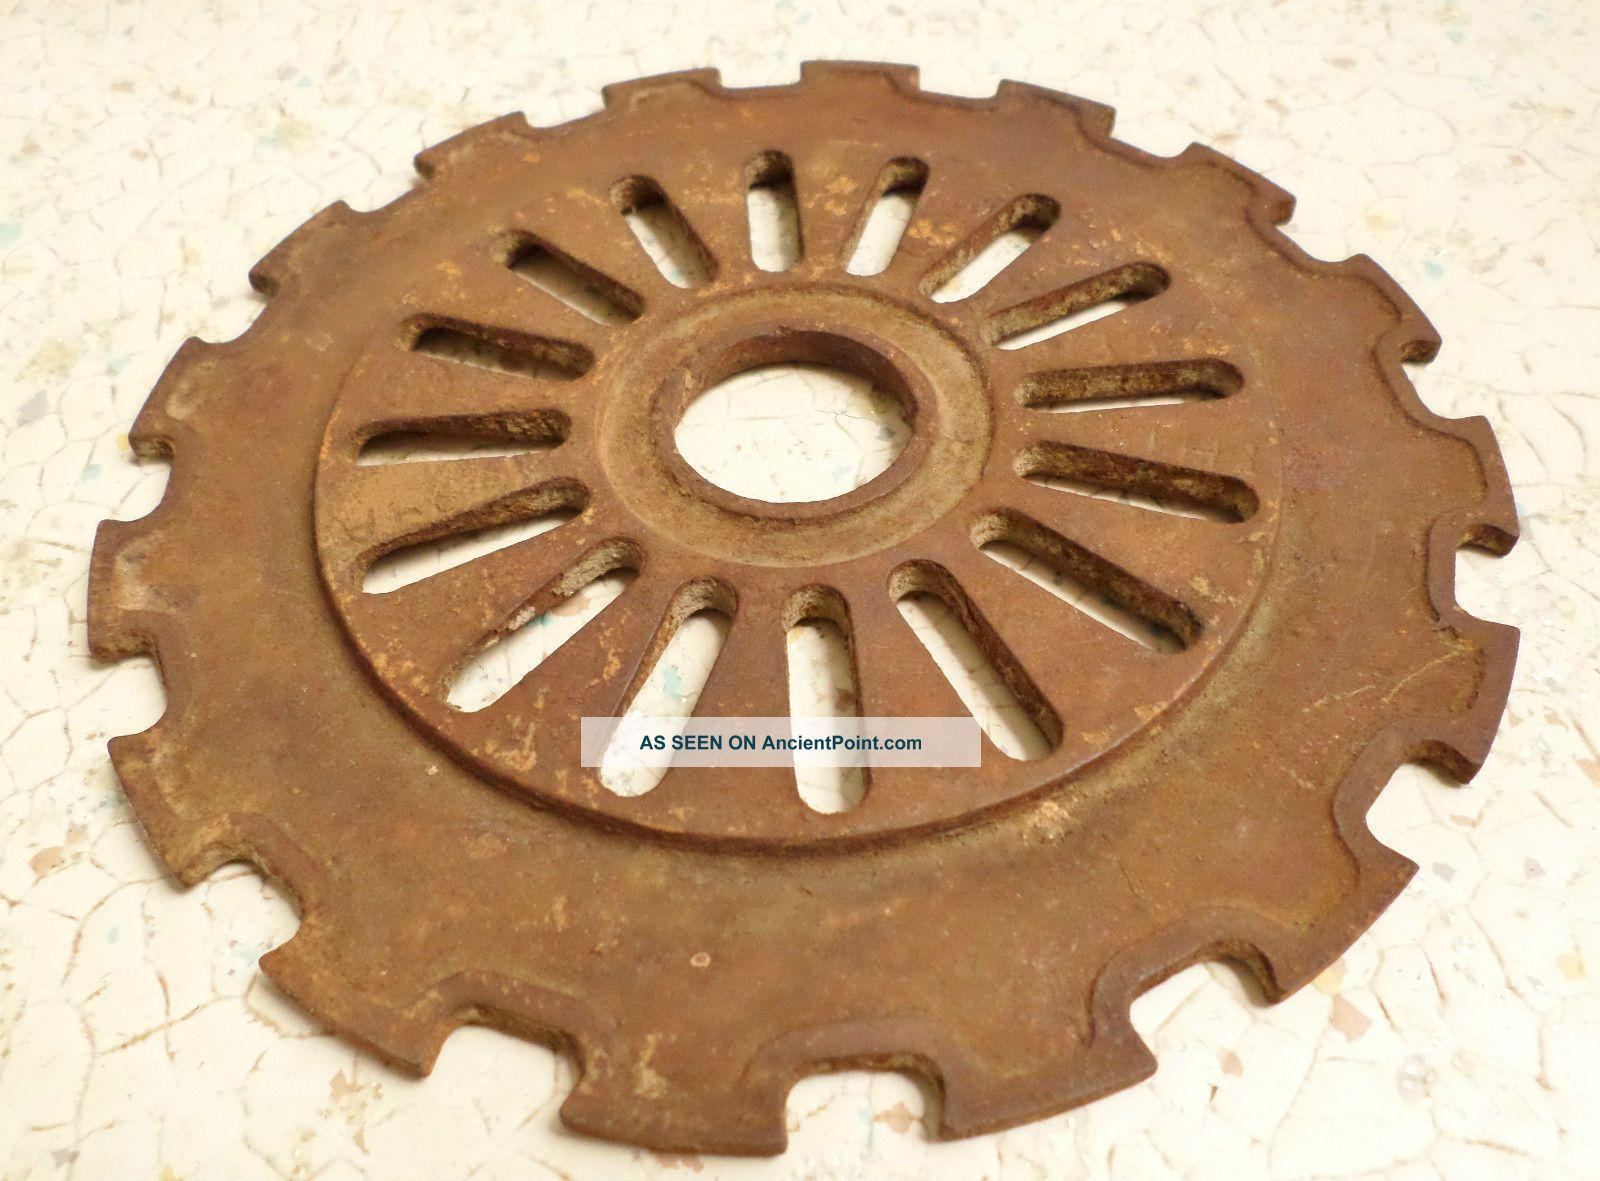 Vintage IH Farm Seed Planter Plate Gear Cast Iron Steampunk